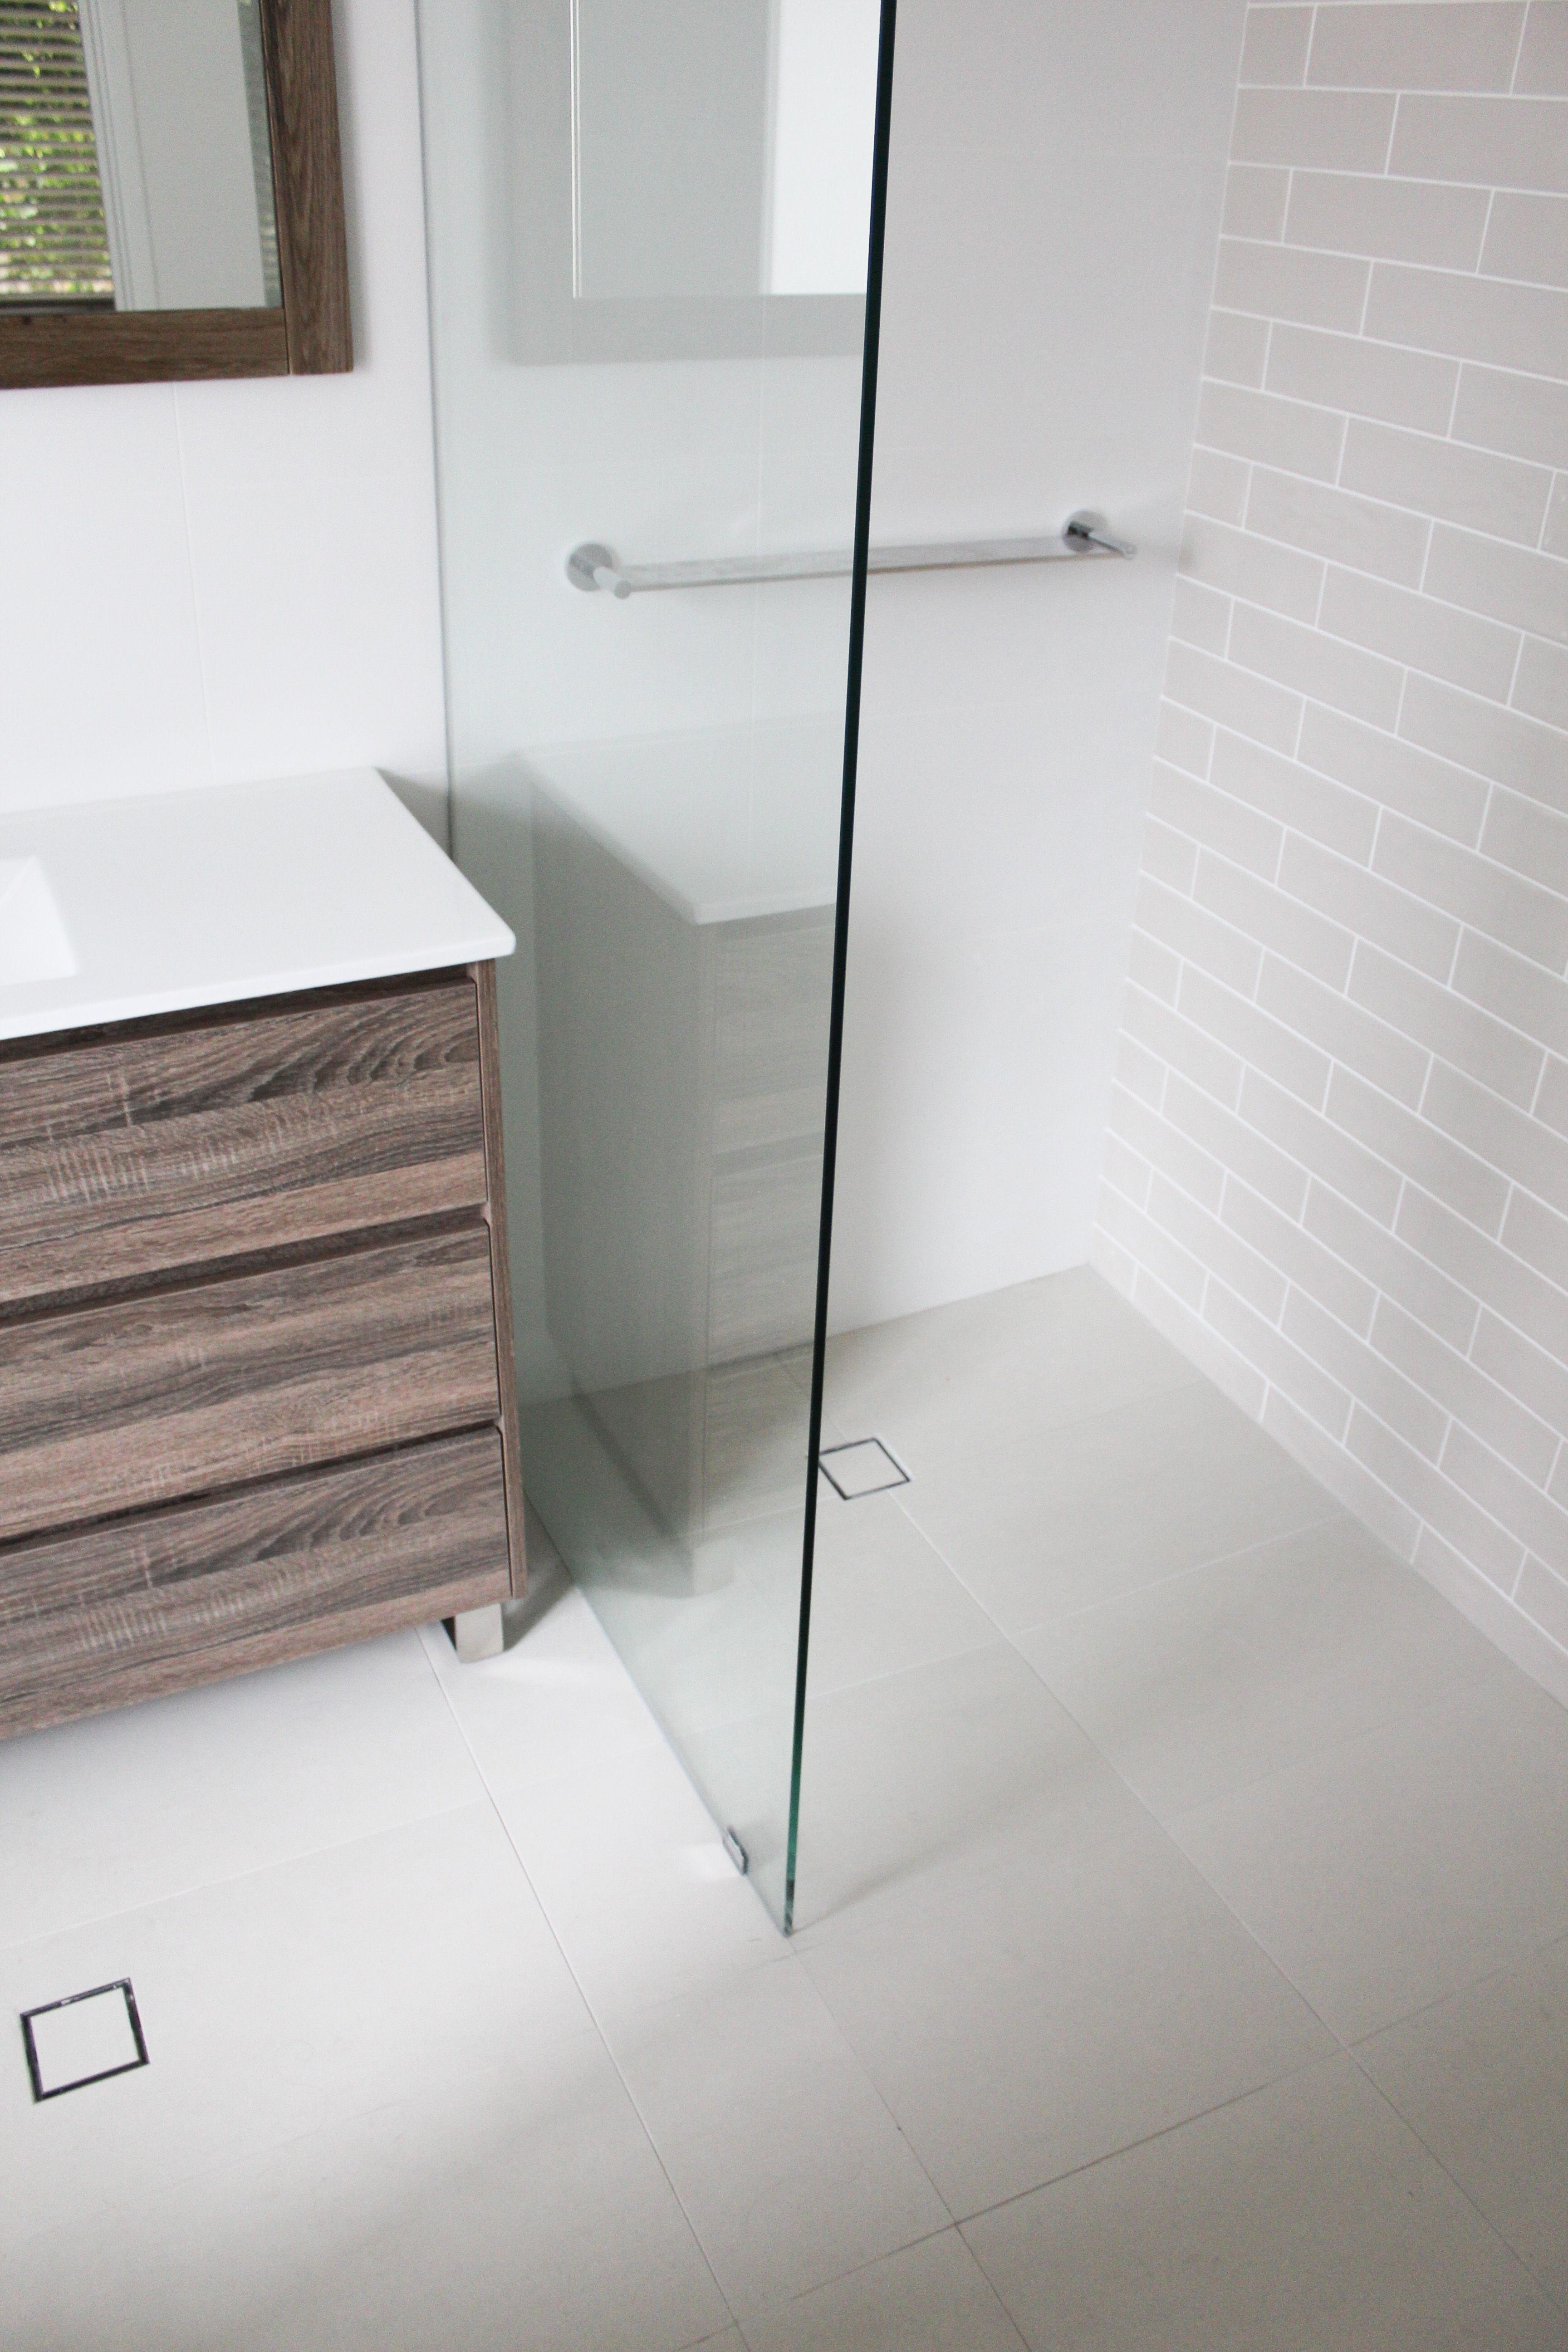 hardwood floor estimate of extraordinary bathroom wood floor at hardwood floor estimate for extraordinary bathroom wood floor at hardwood floor estimate